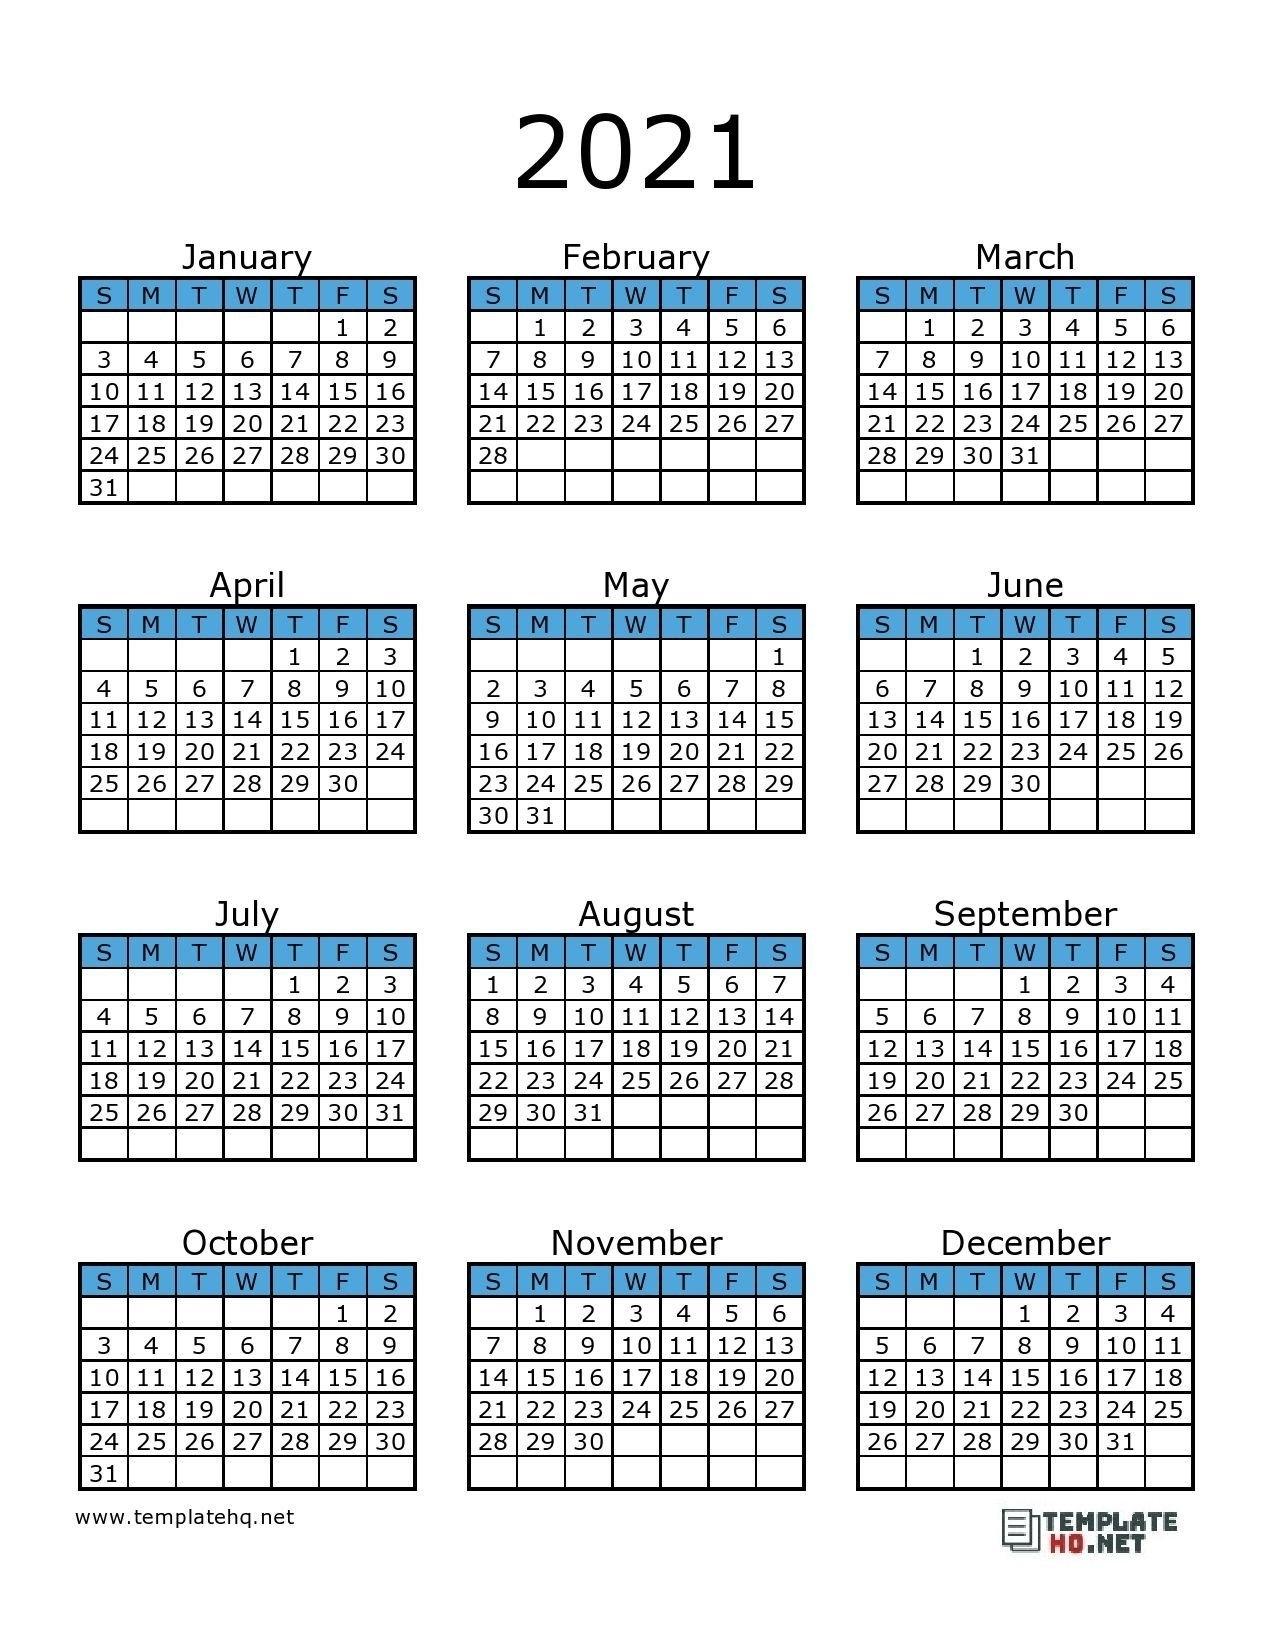 Printable 2021 F-1 Schedule - Example Calendar Printable inside Free Printable Calendar 2021 Daily Graphics